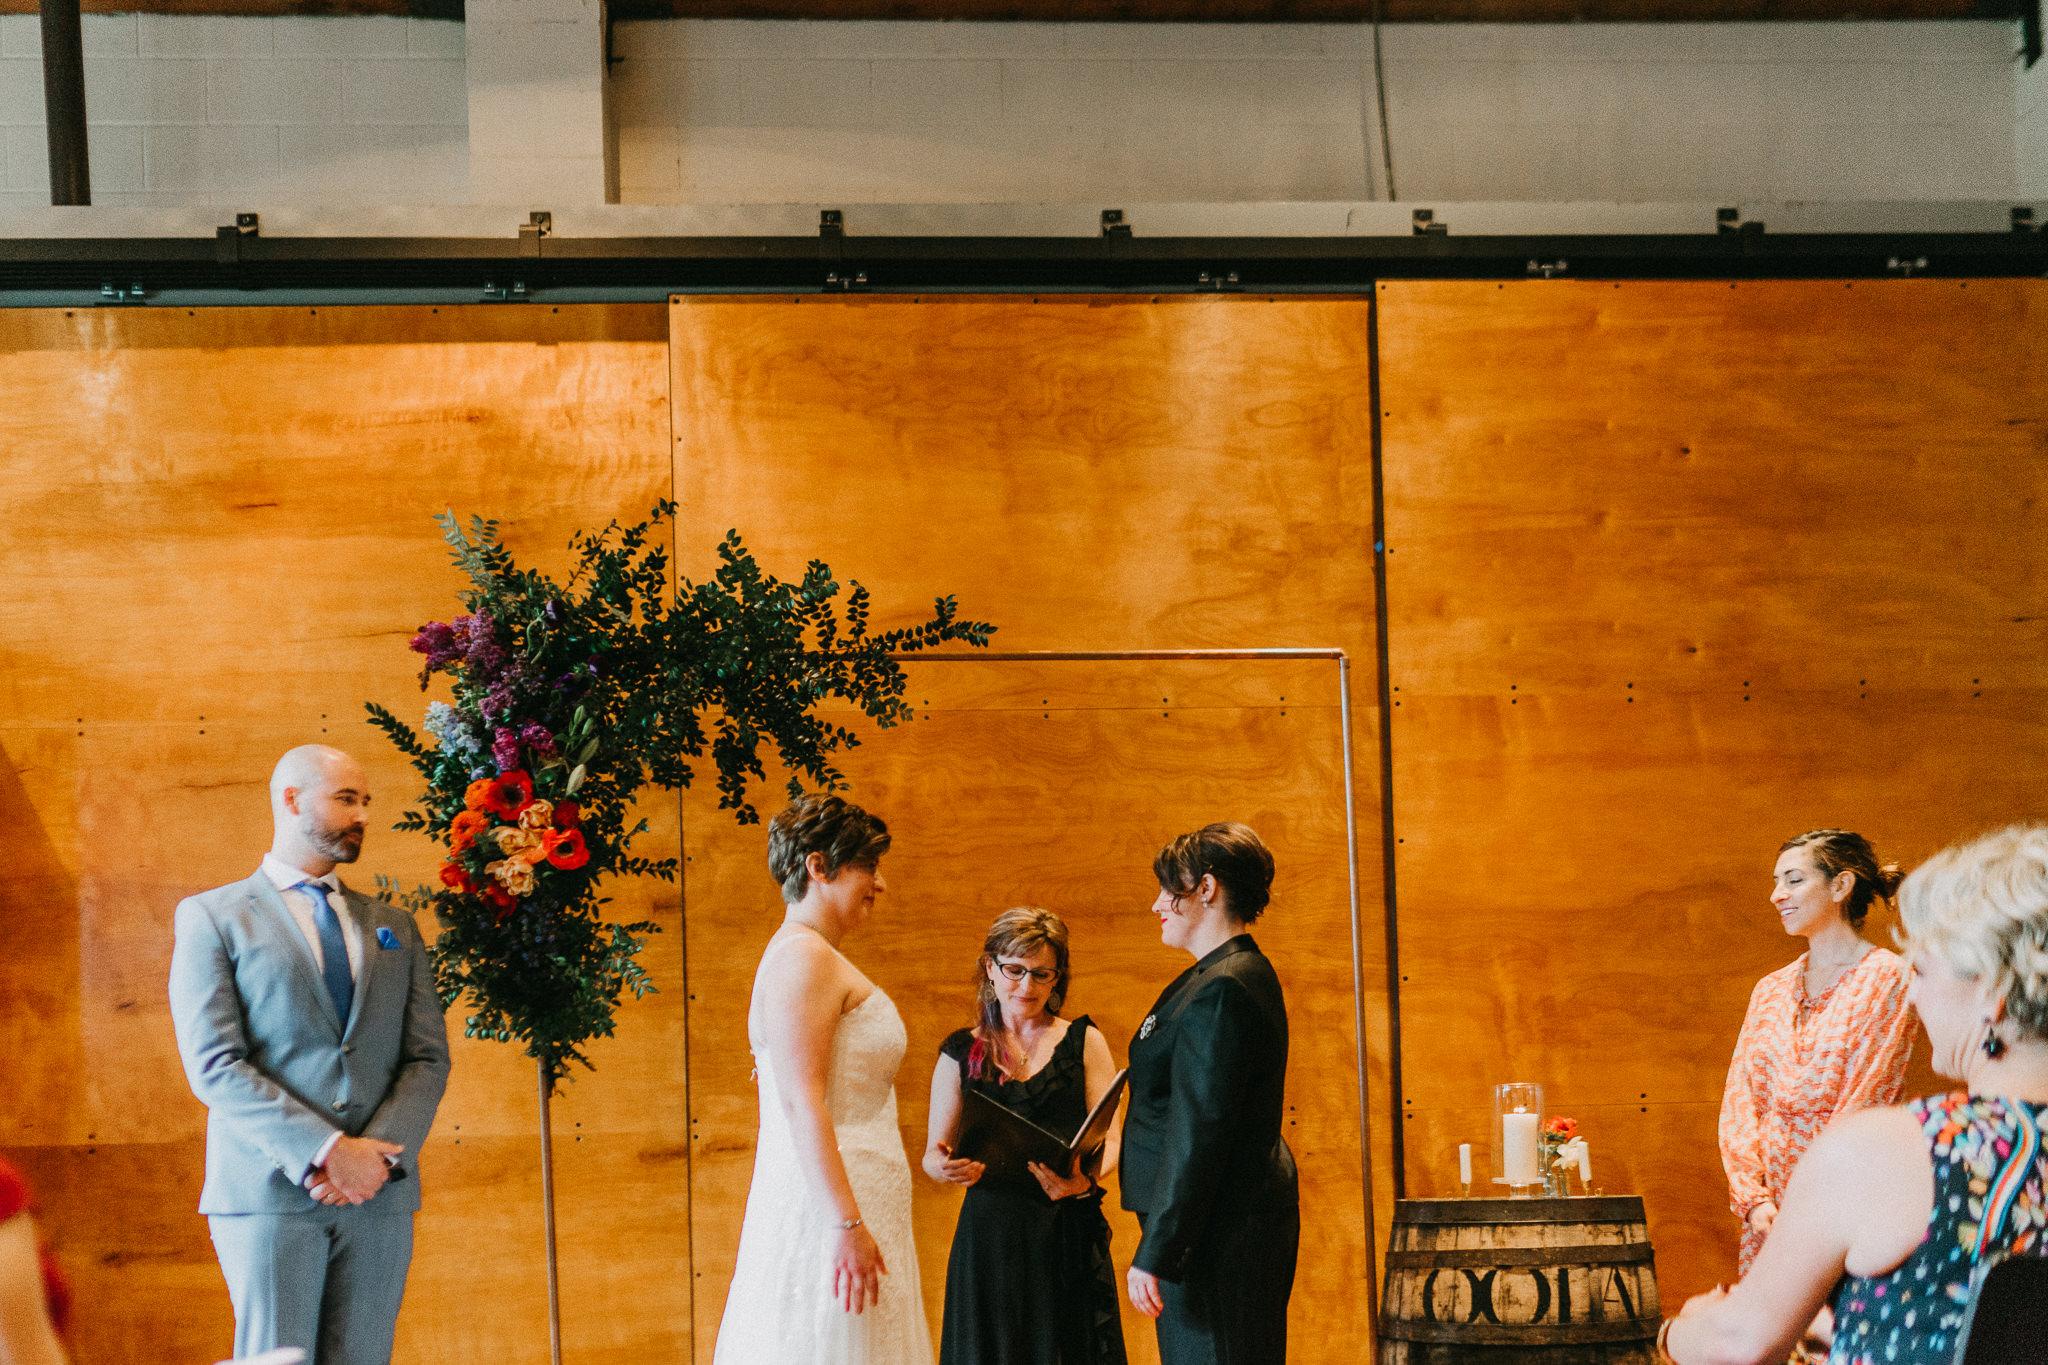 !0 Degrees Seattle Wedding Venue Same Sex